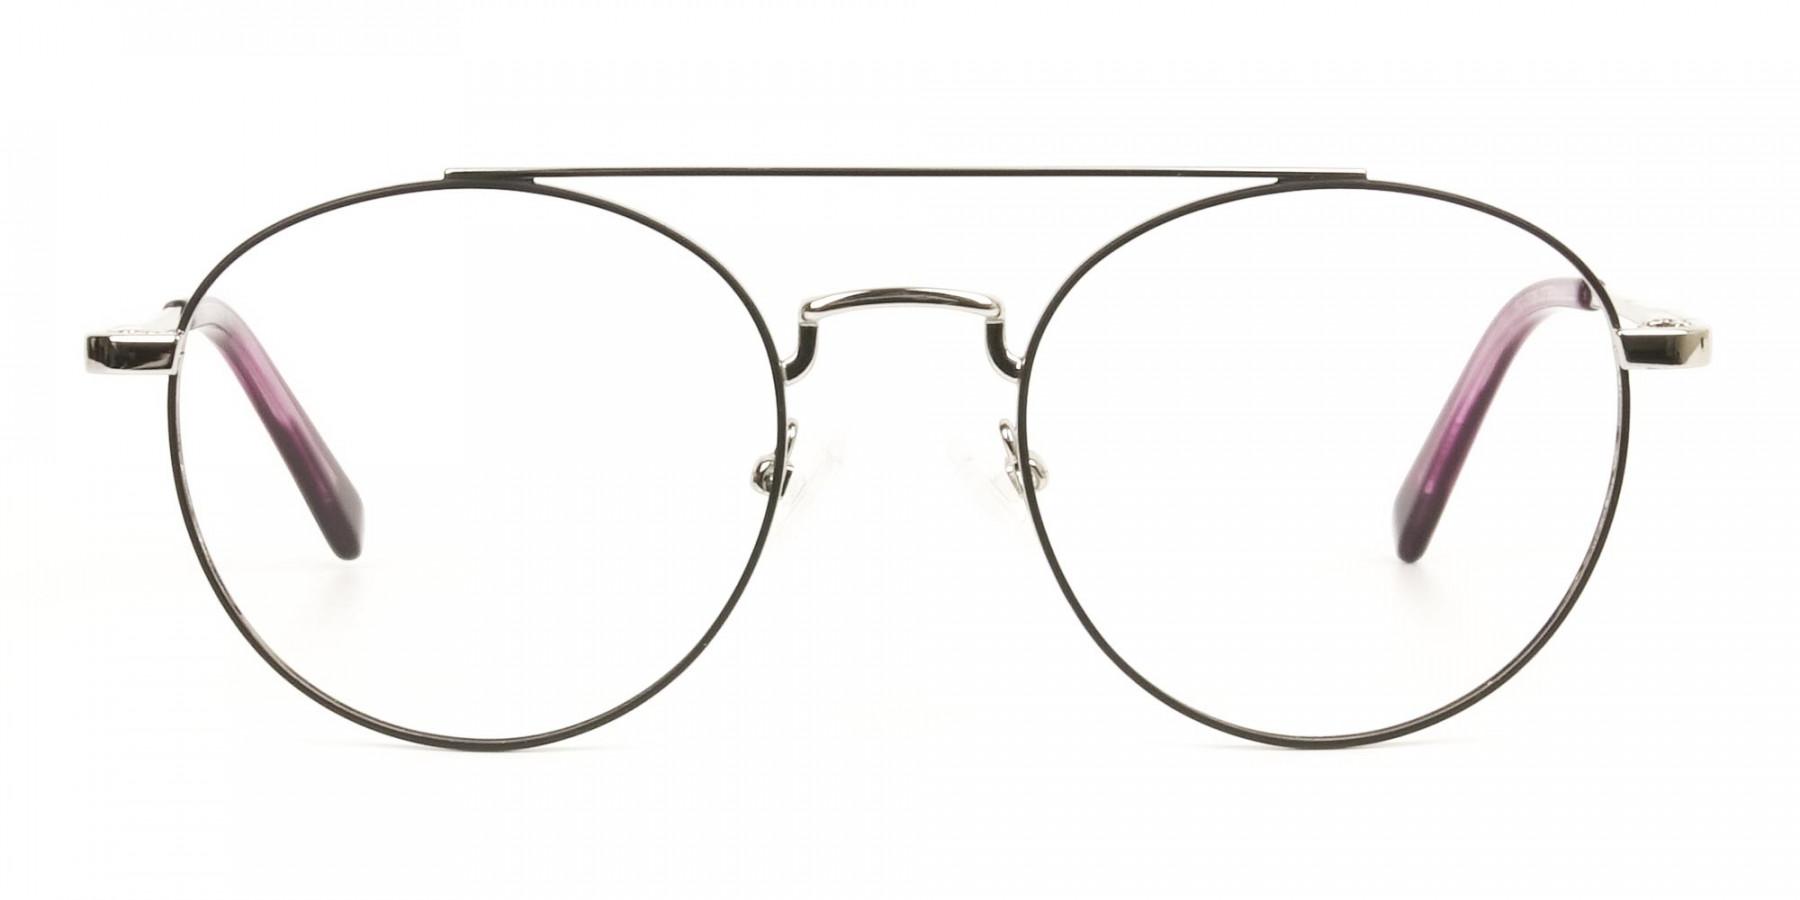 Lightweight Black & Silver Round Aviator Glasses in Metal - 1